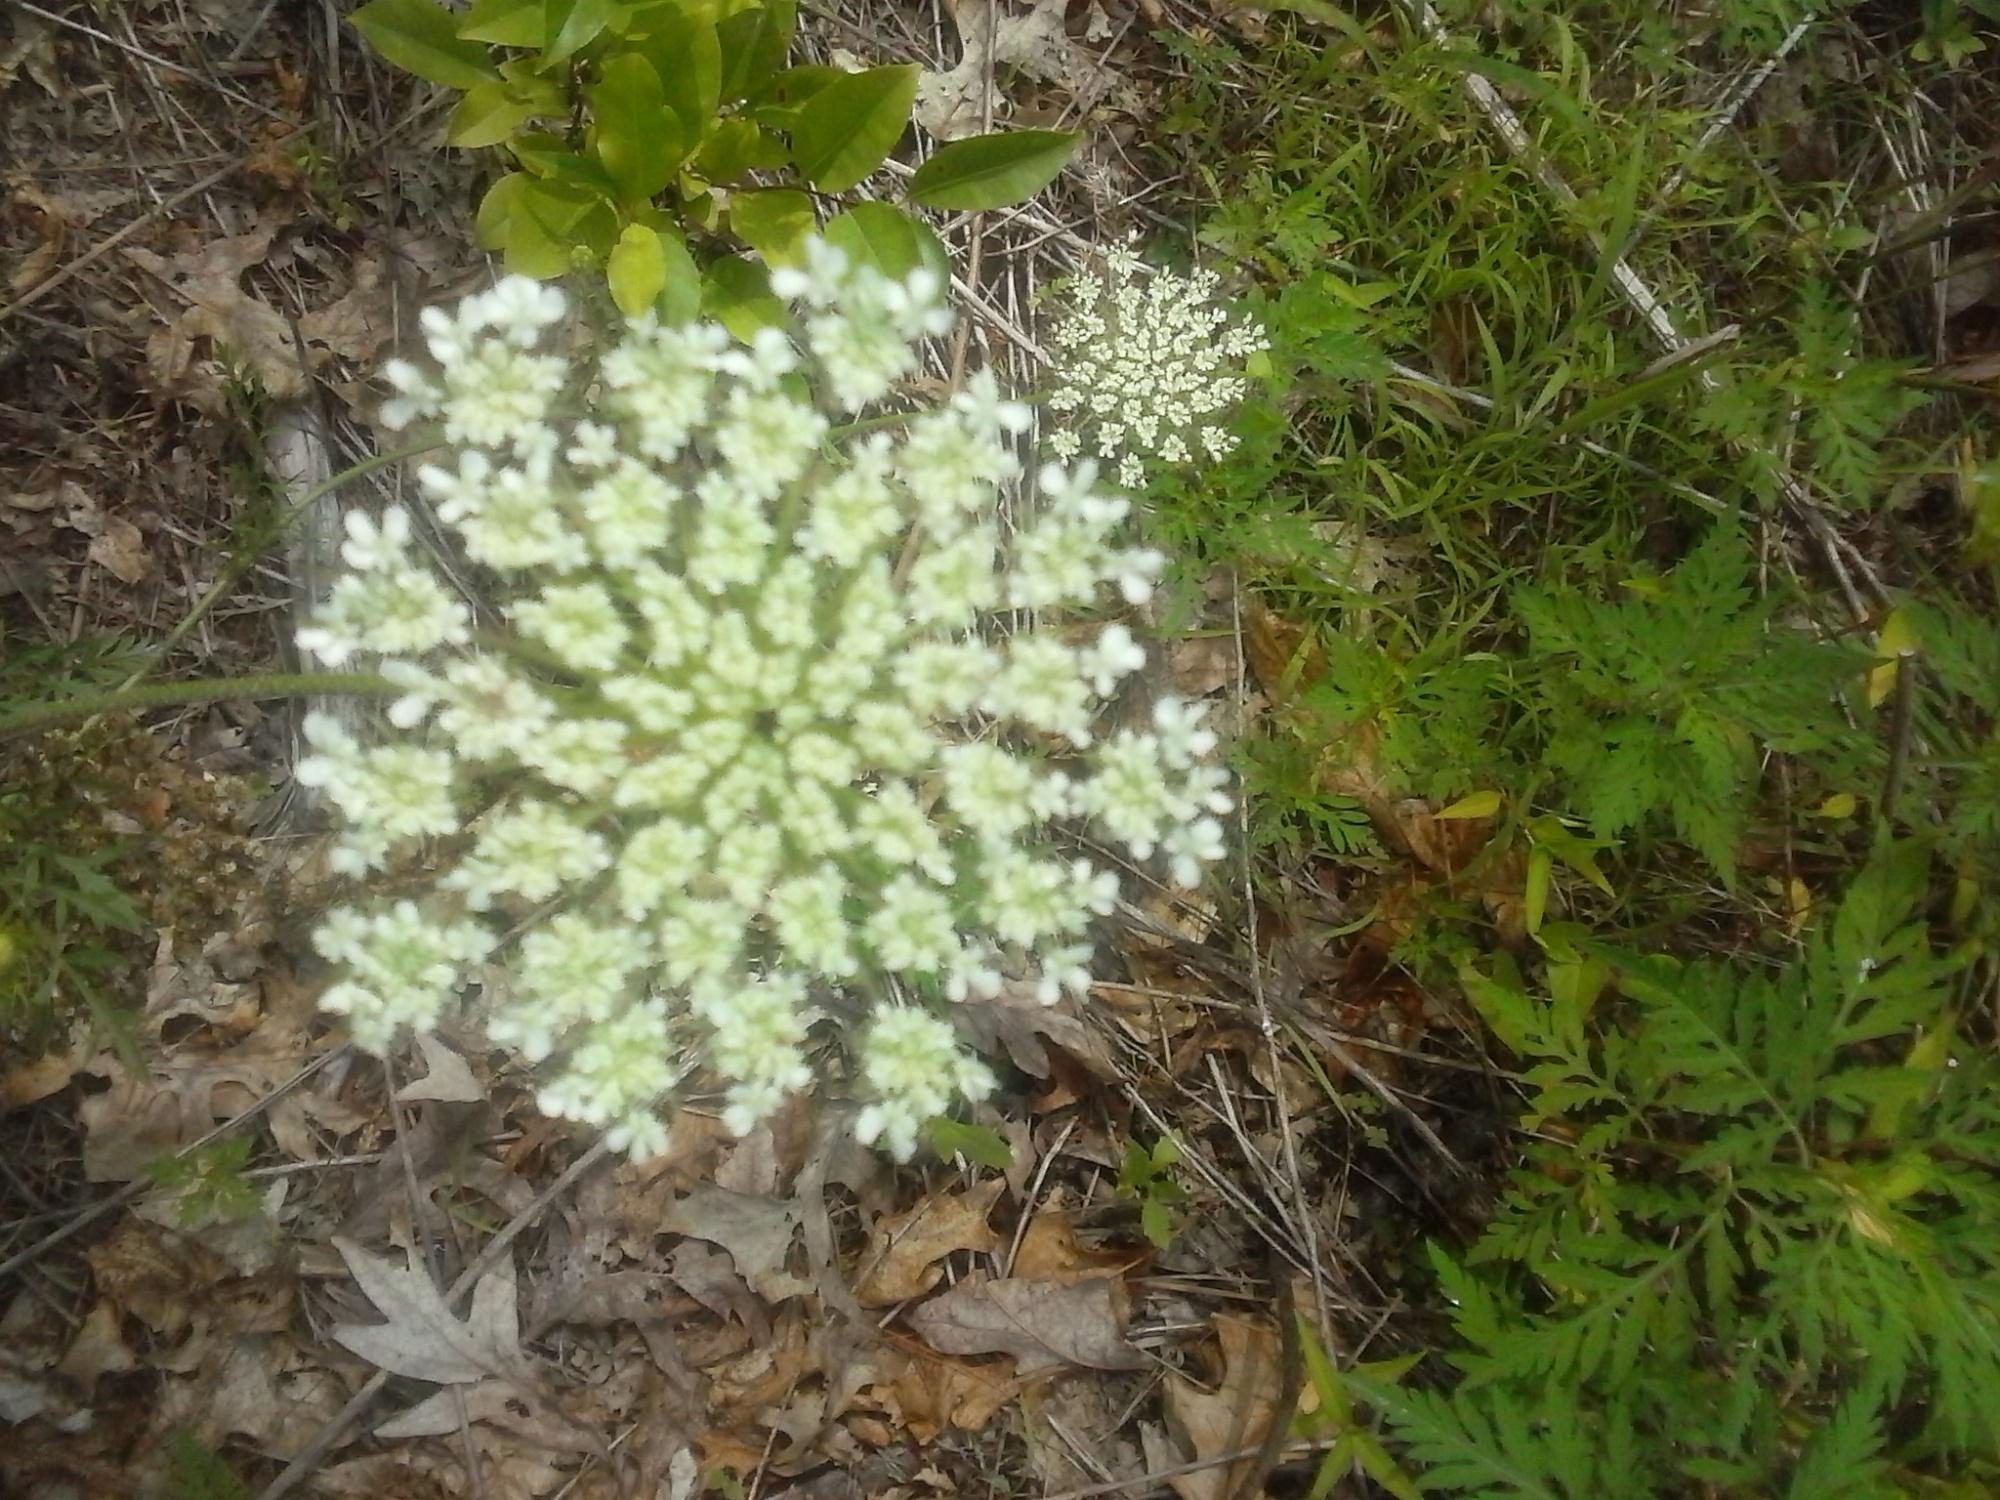 Healing Salves Wildlettucegals Blog